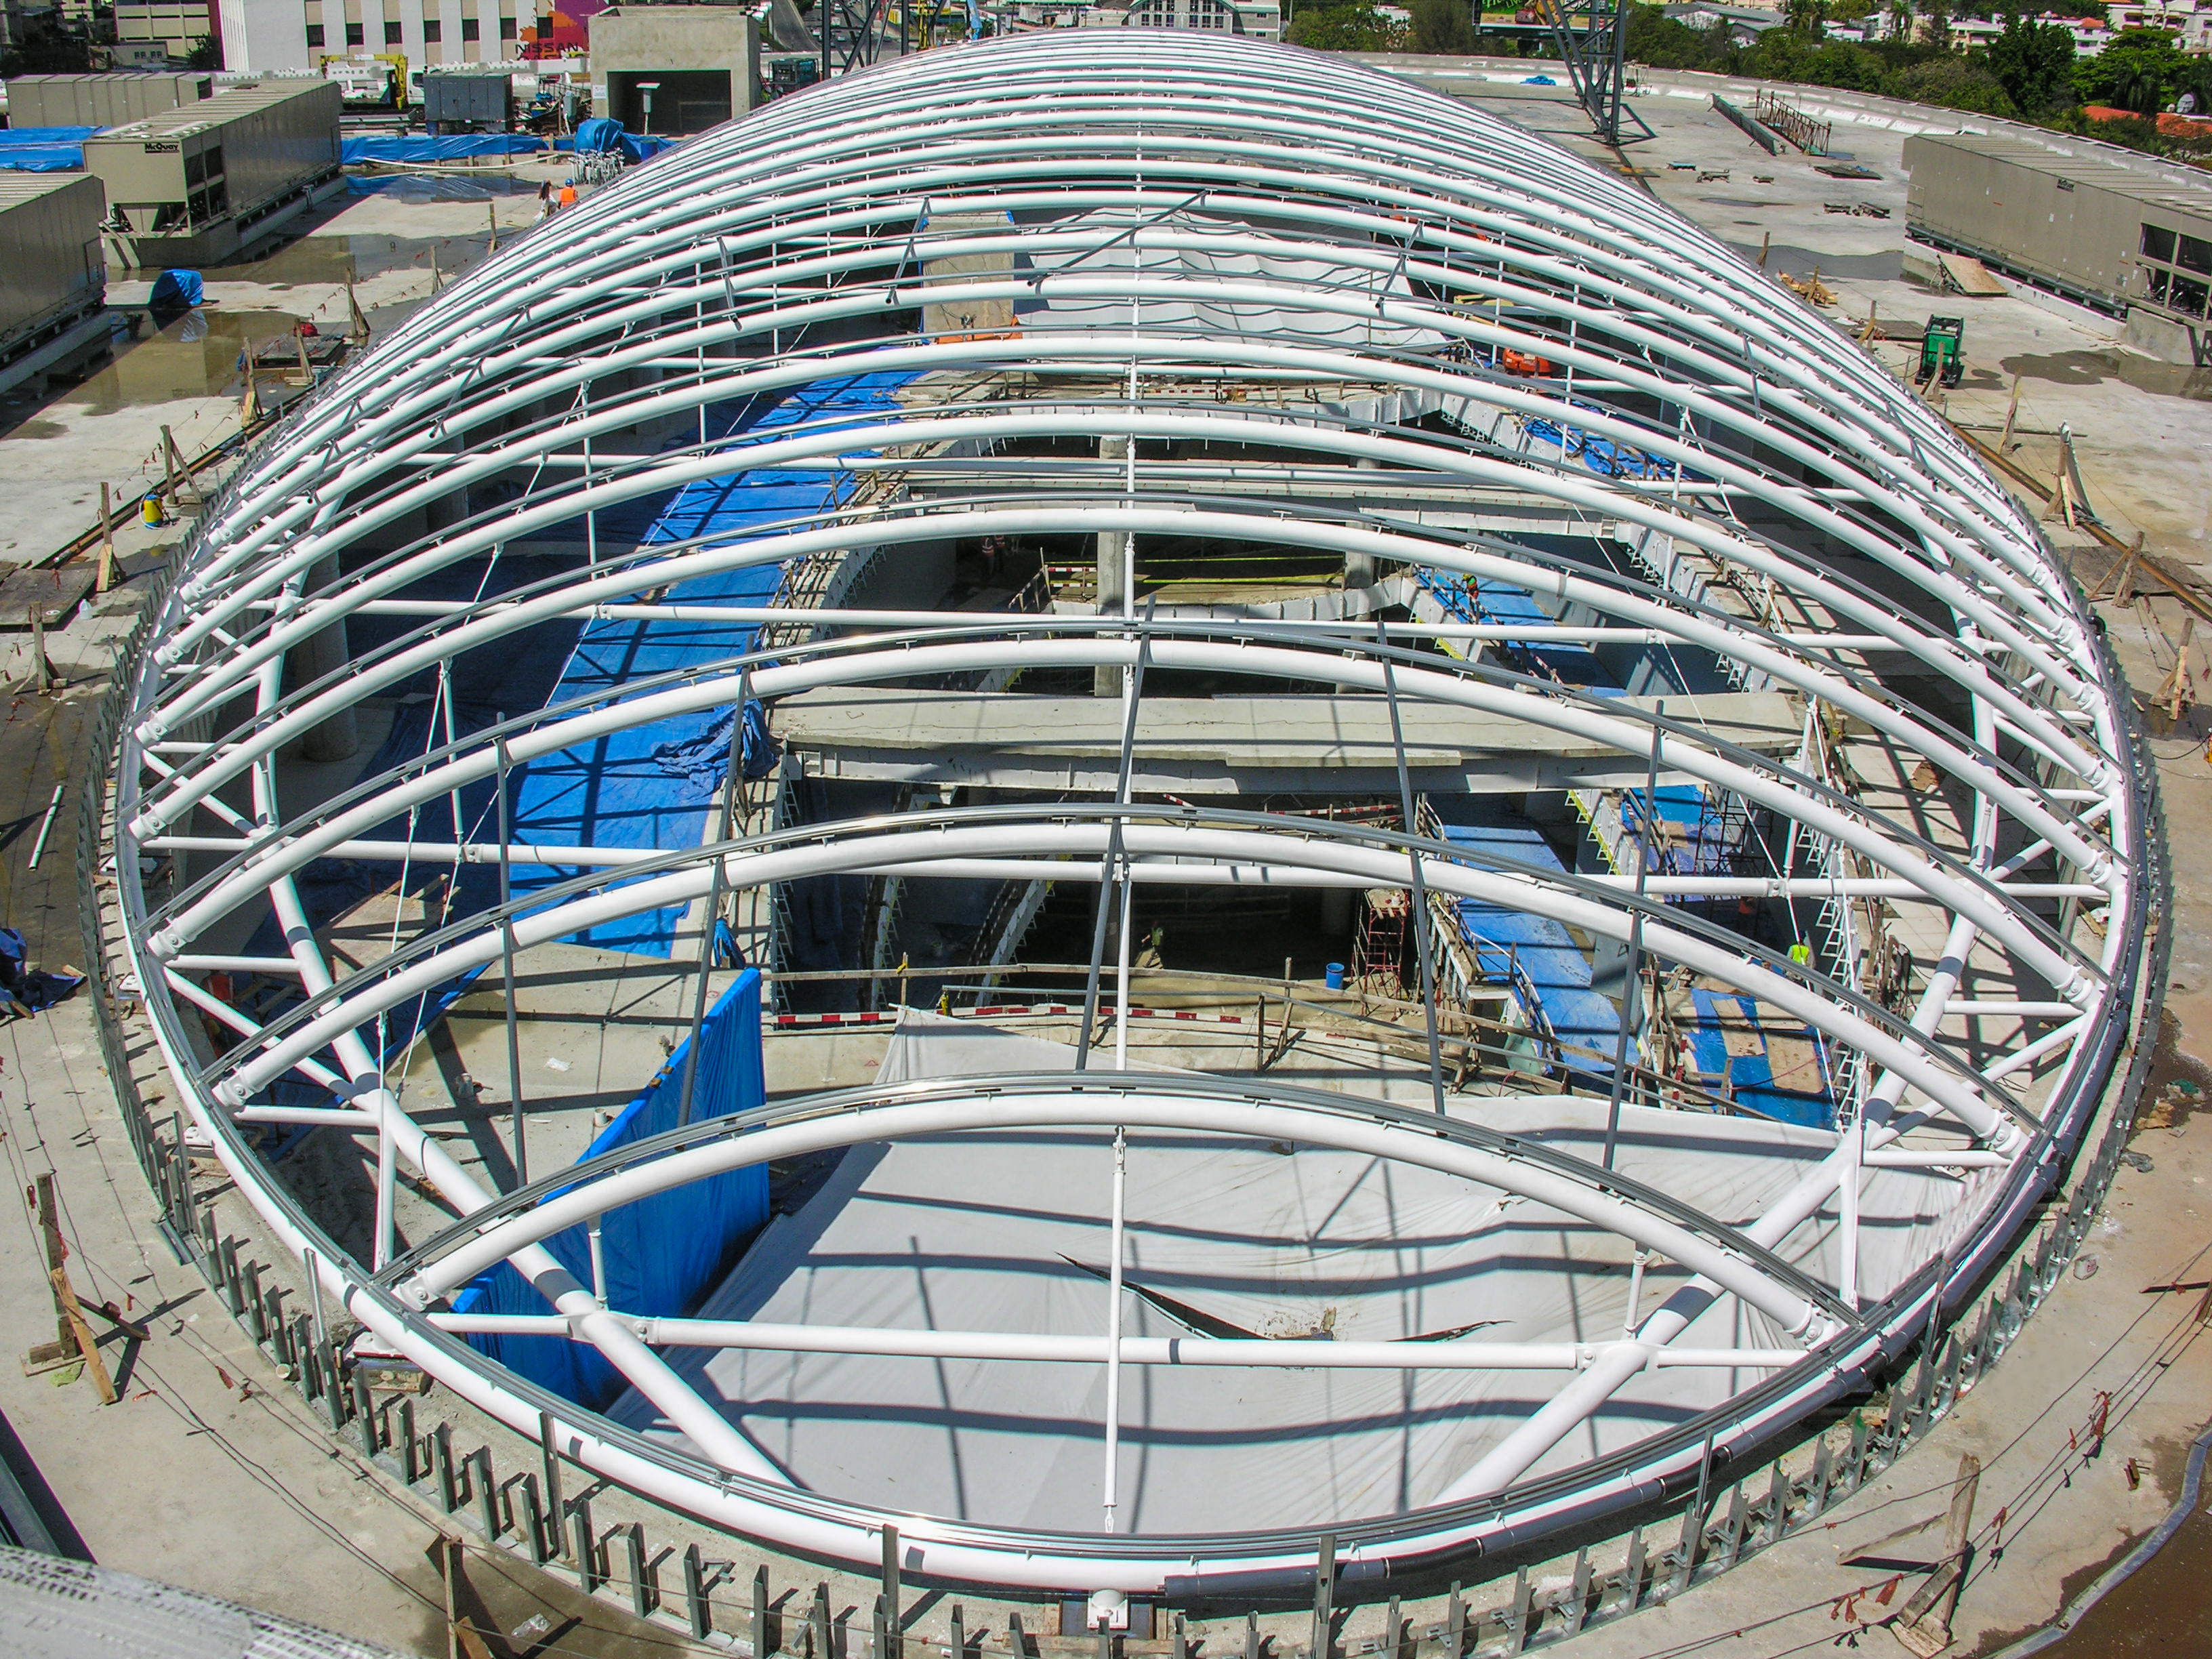 Estructura metalica domo Agora Mall al descubierto sin lona